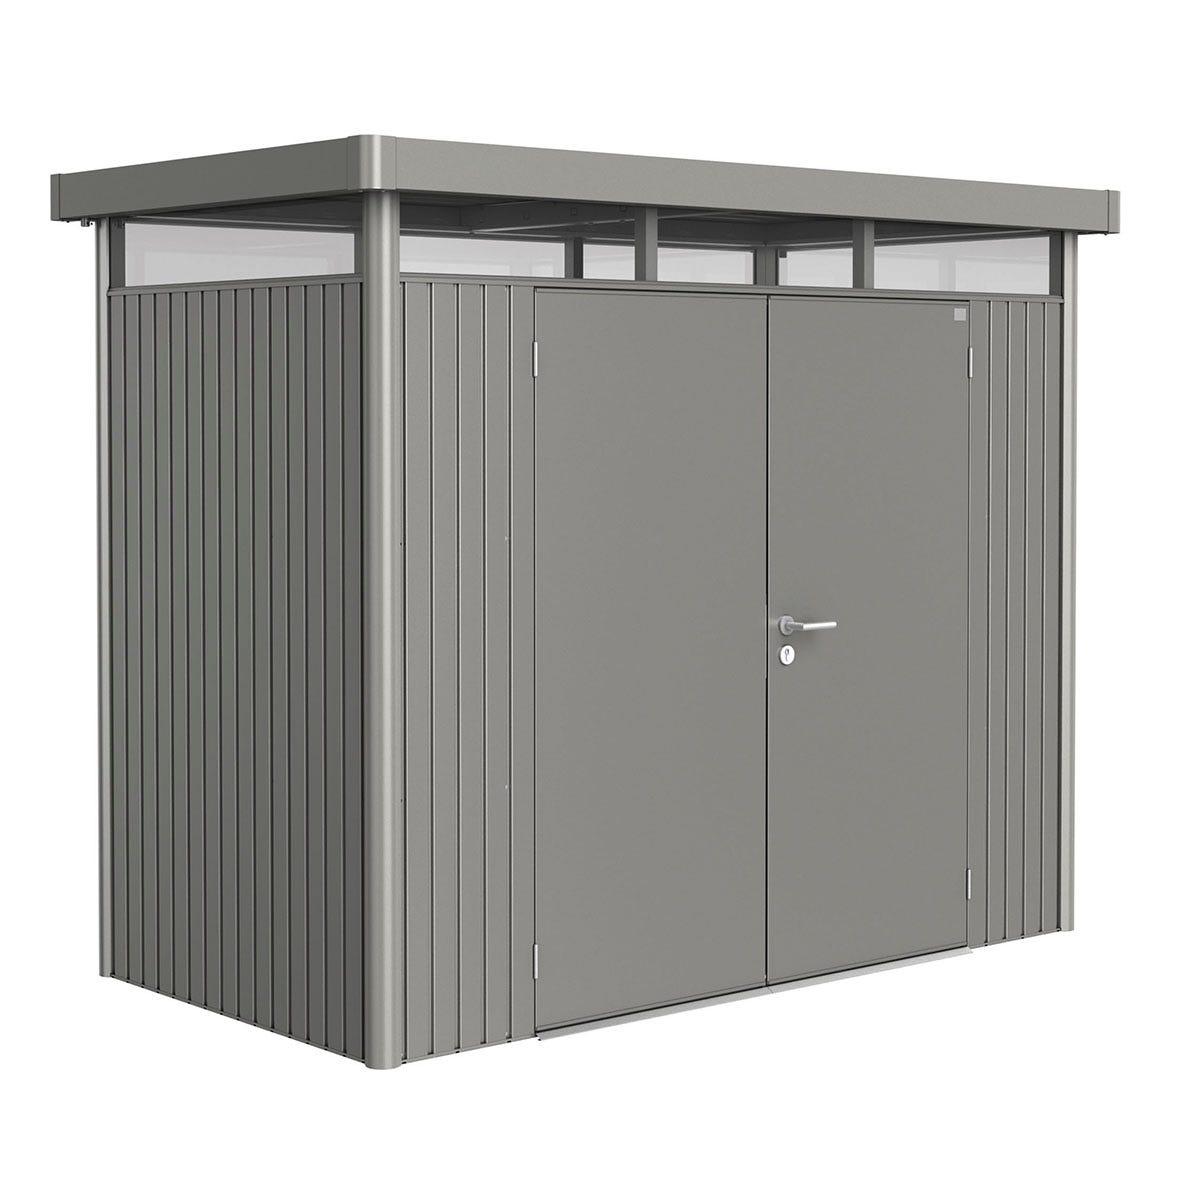 Biohort Highline Metal Shed H1 Double door 9 x 5 - Quartz Grey